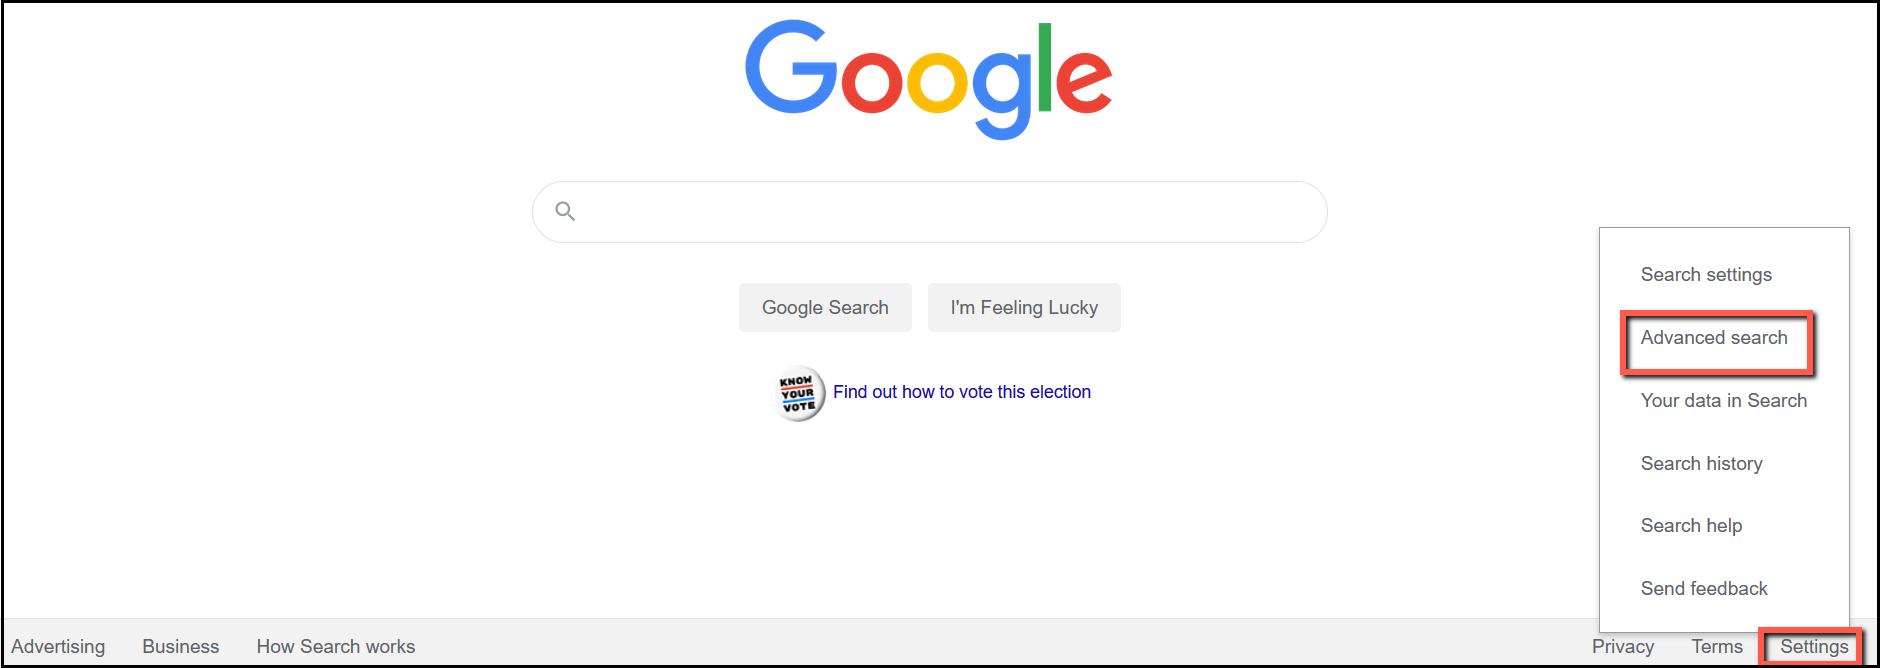 Use Google Settings to choose Advanced Search